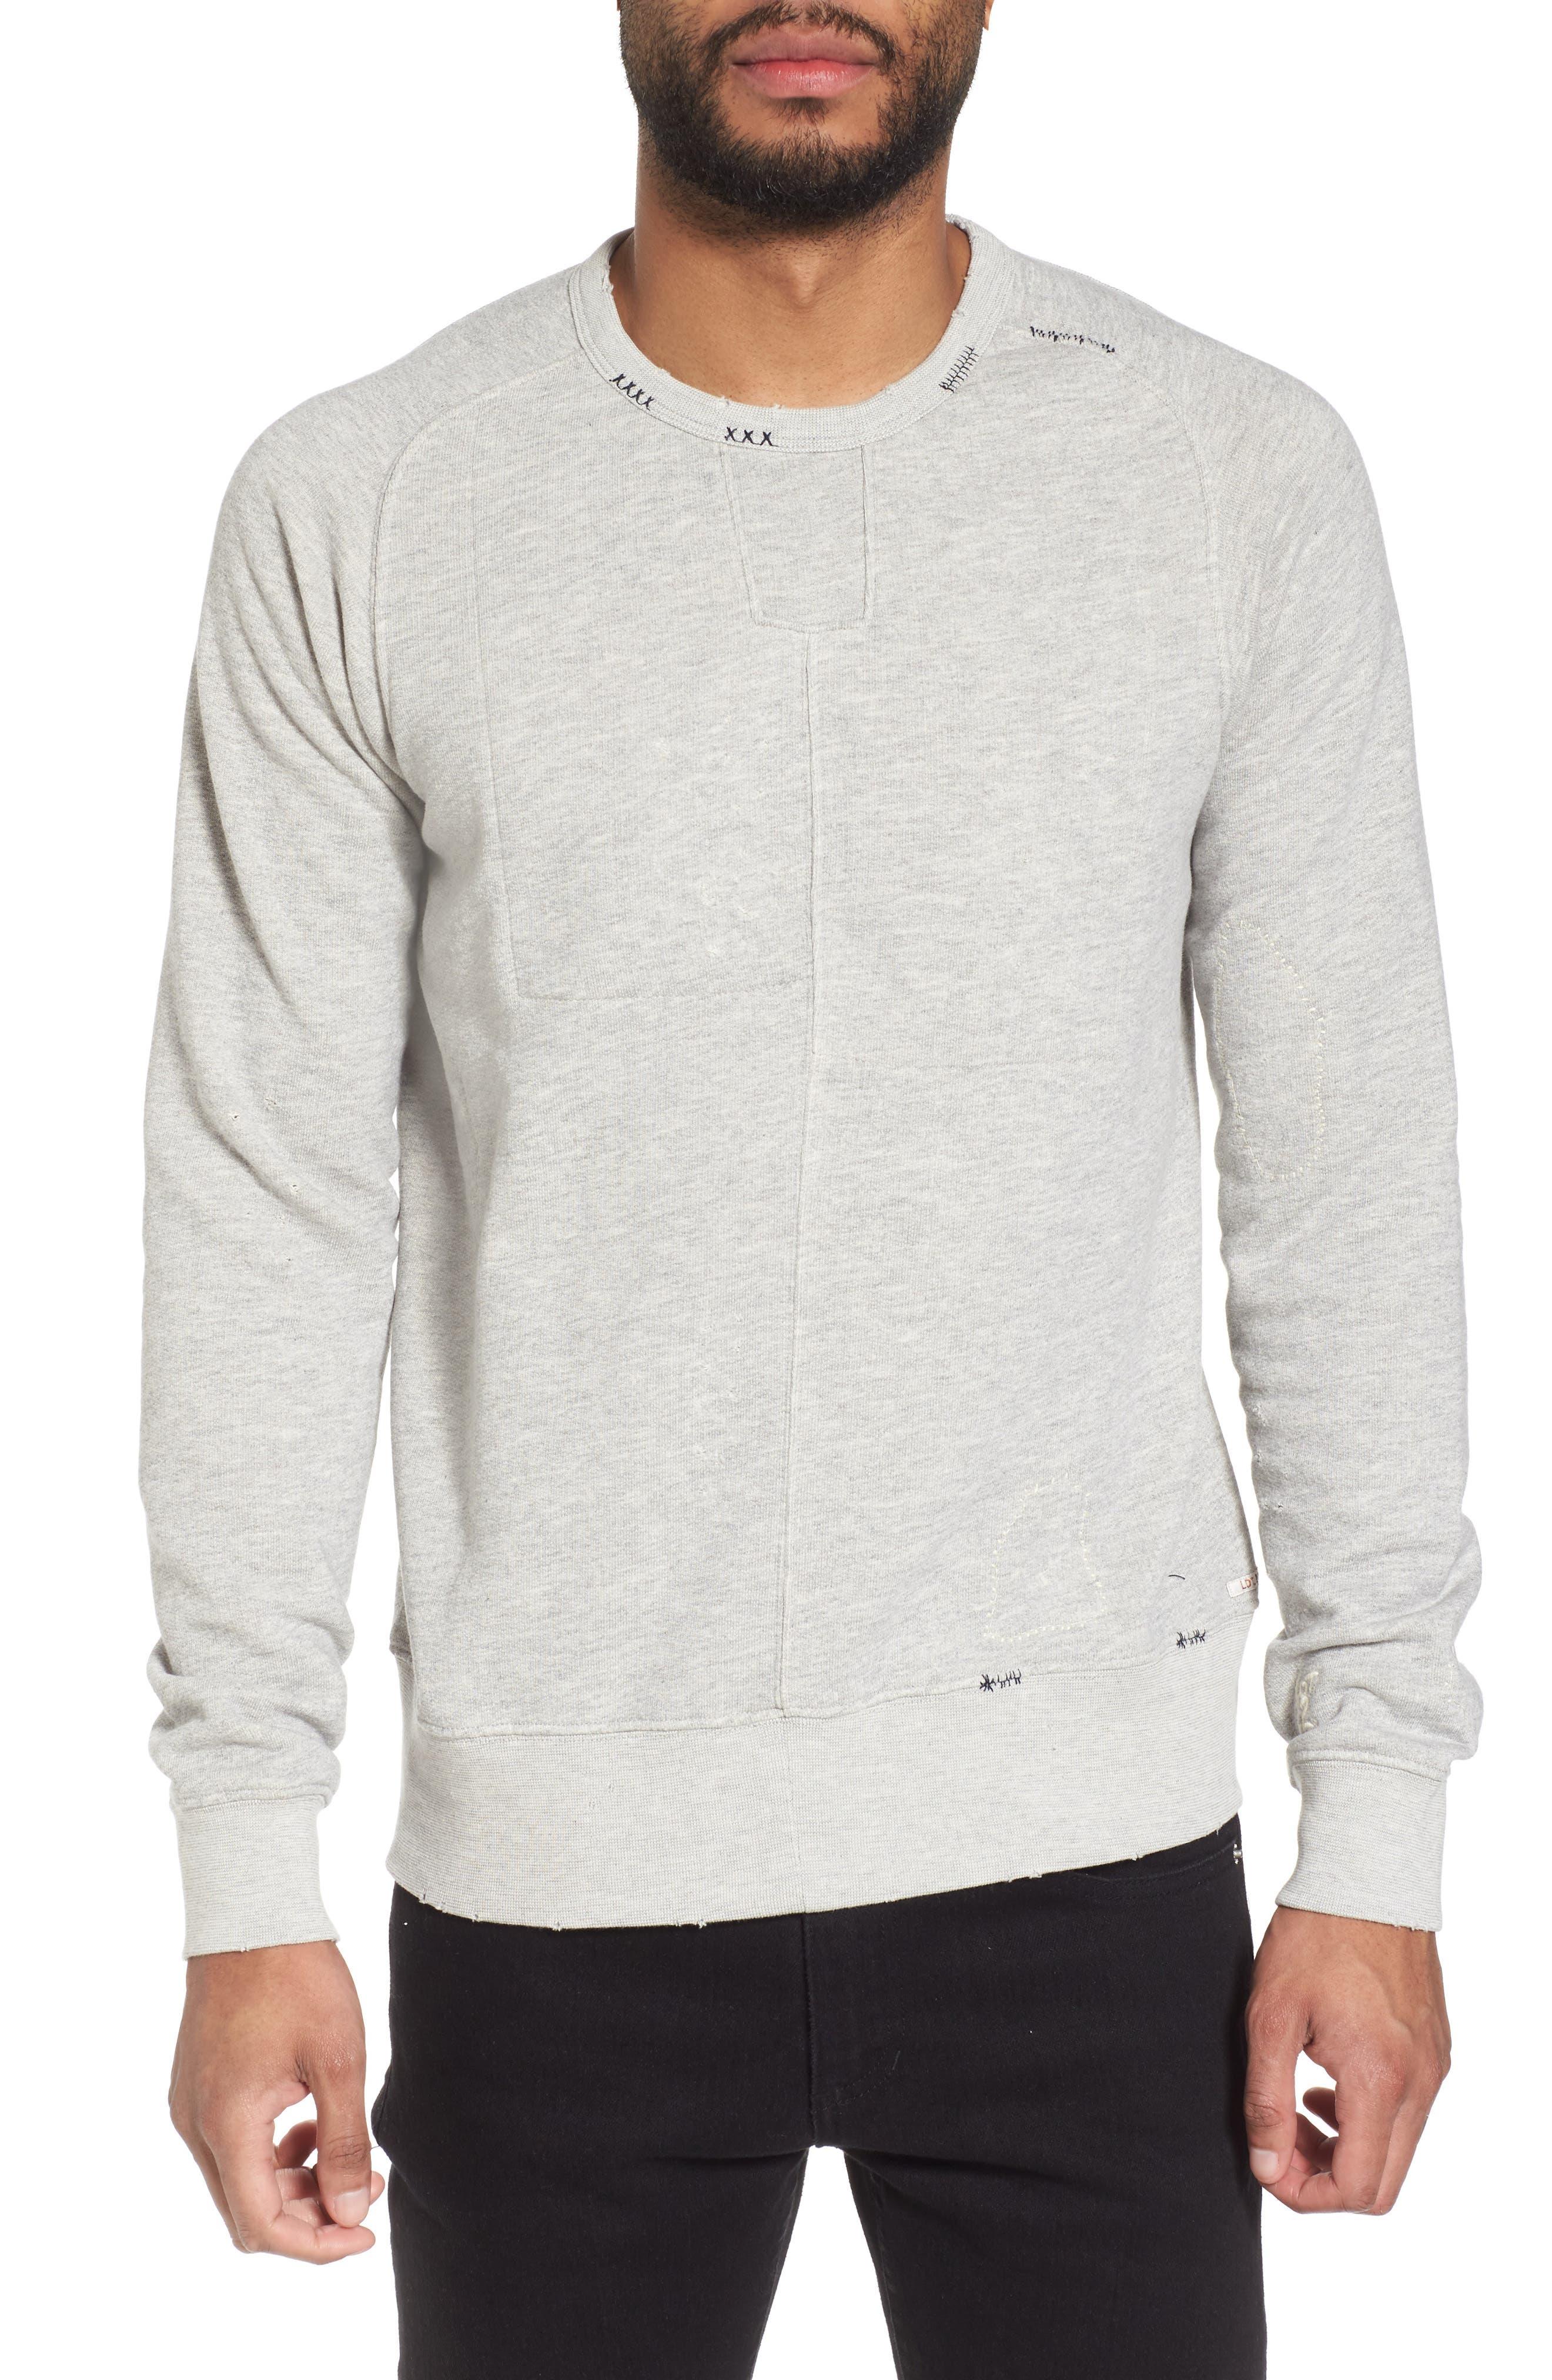 Lot 22 Sweatshirt,                         Main,                         color, 450